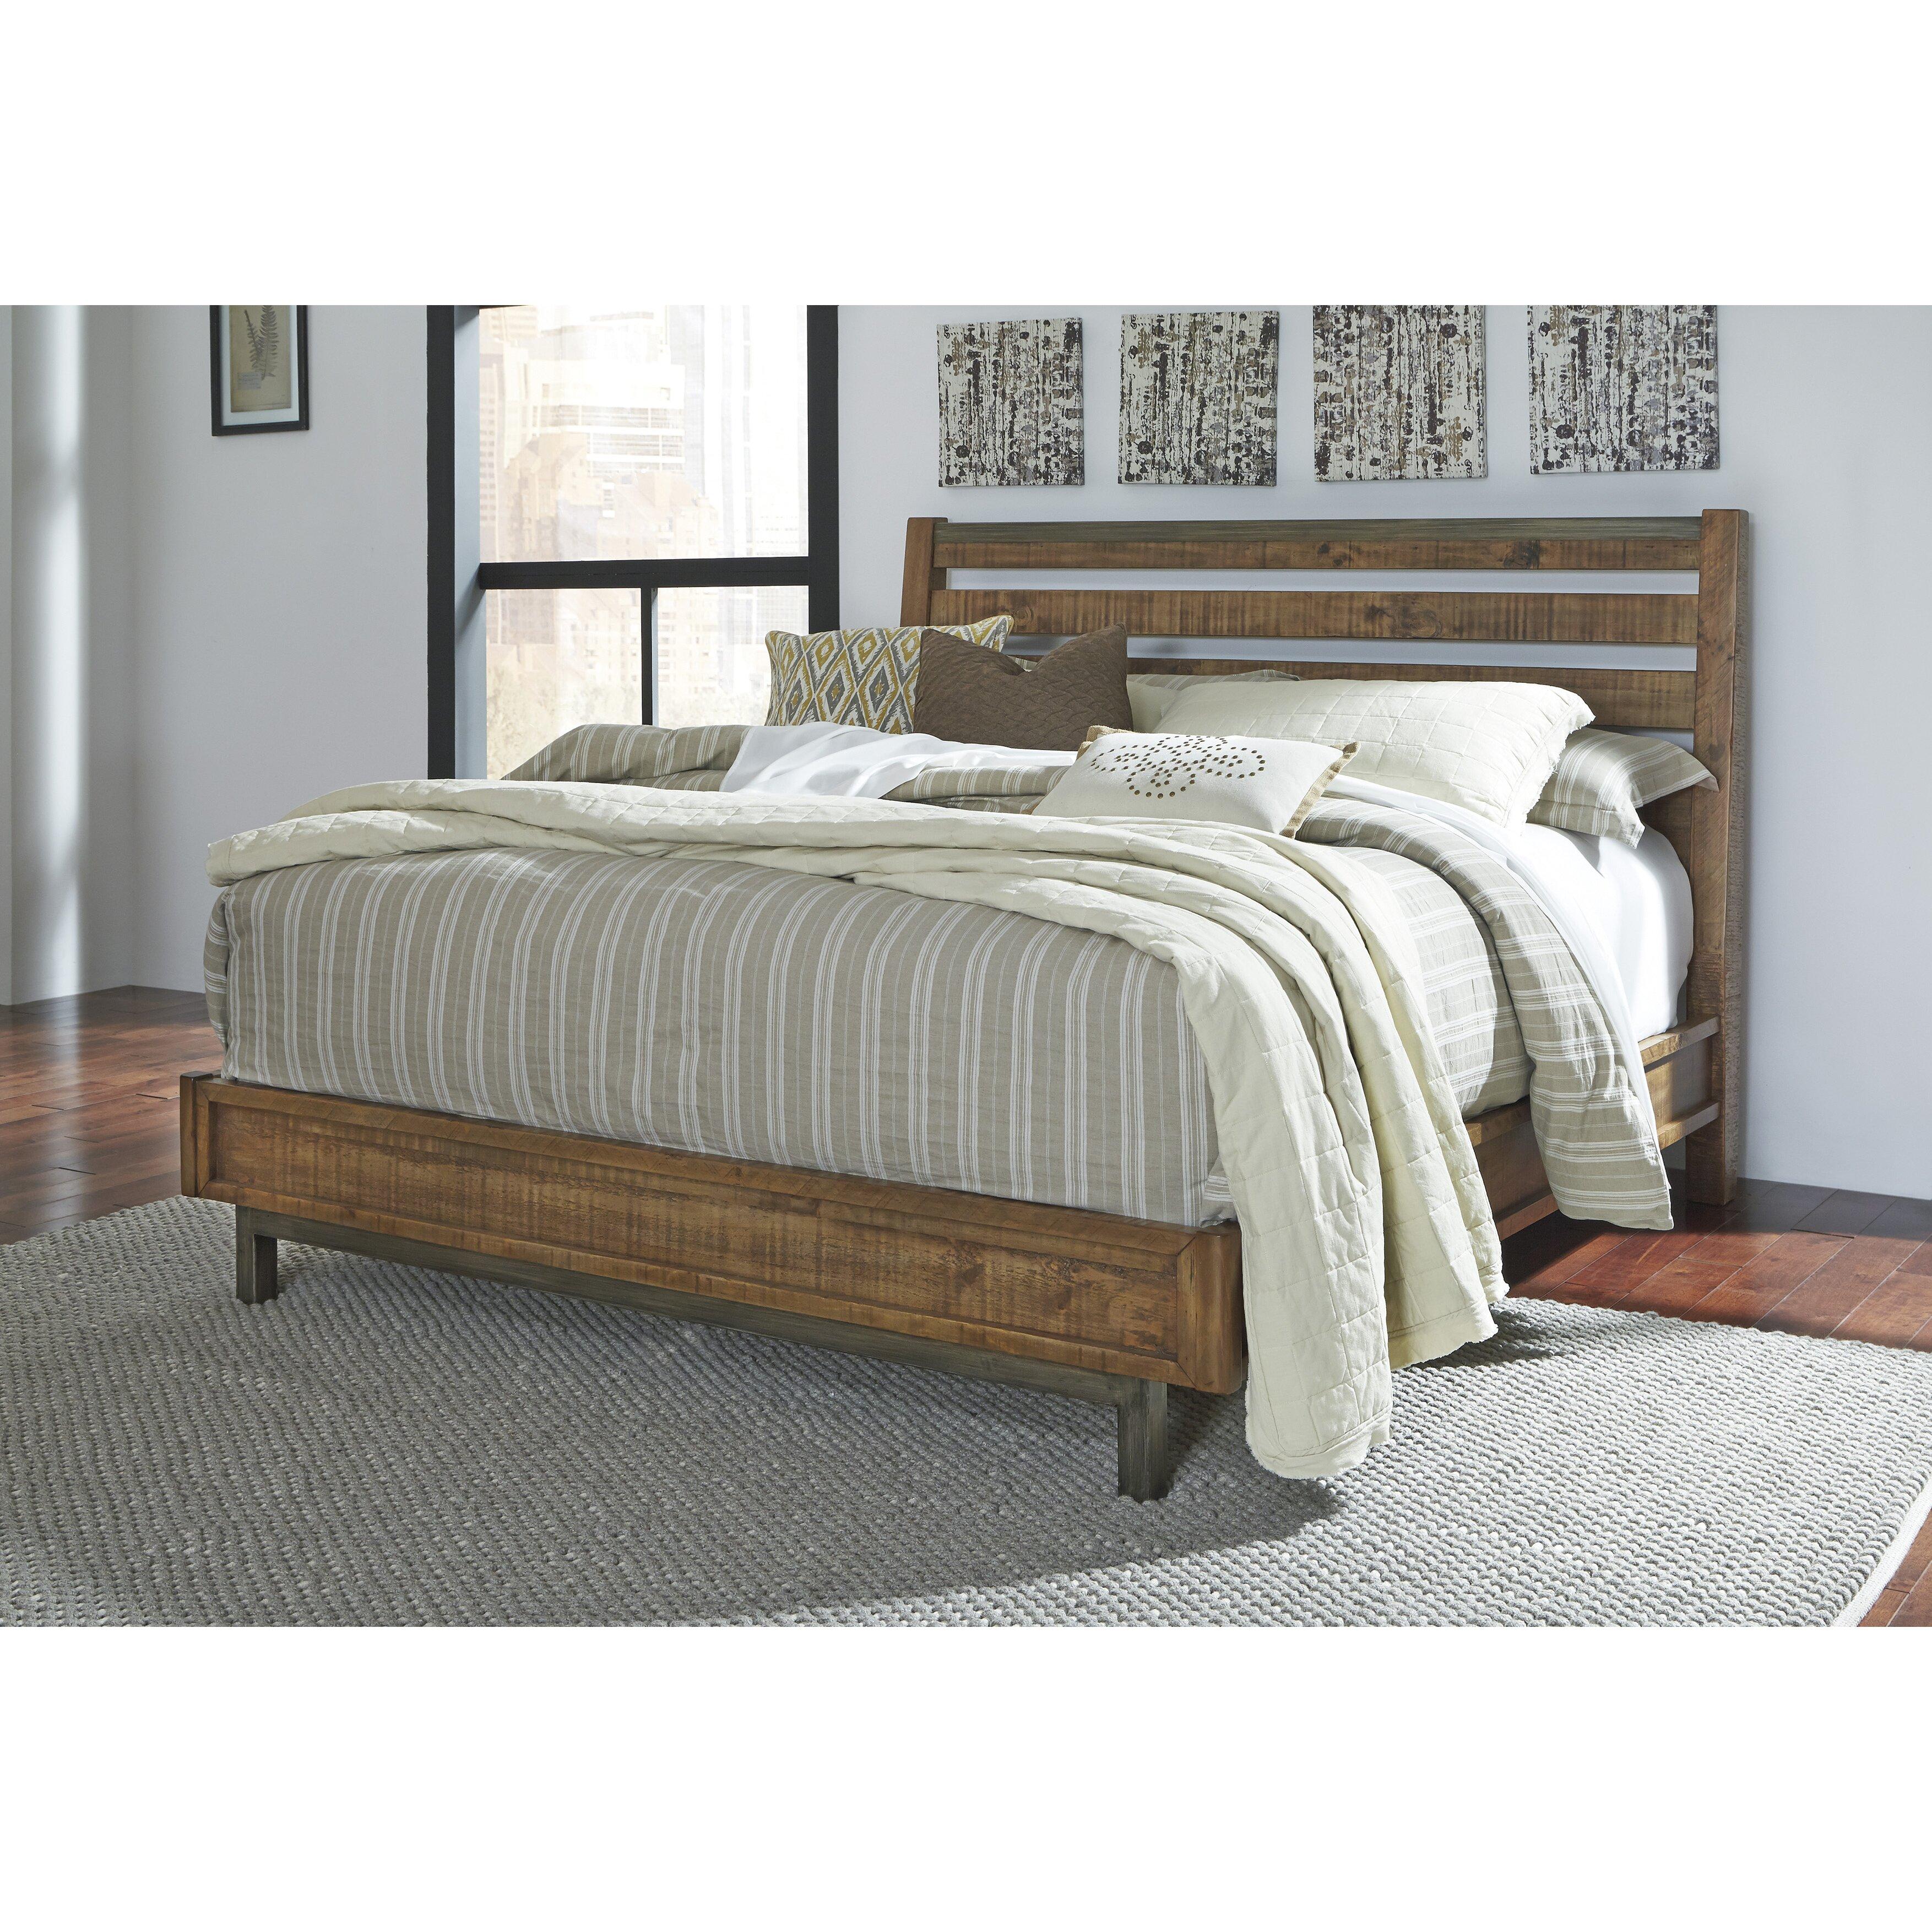 Laurel Foundry Modern Farmhouse Desjardins Panel Bed Reviews Wayfair